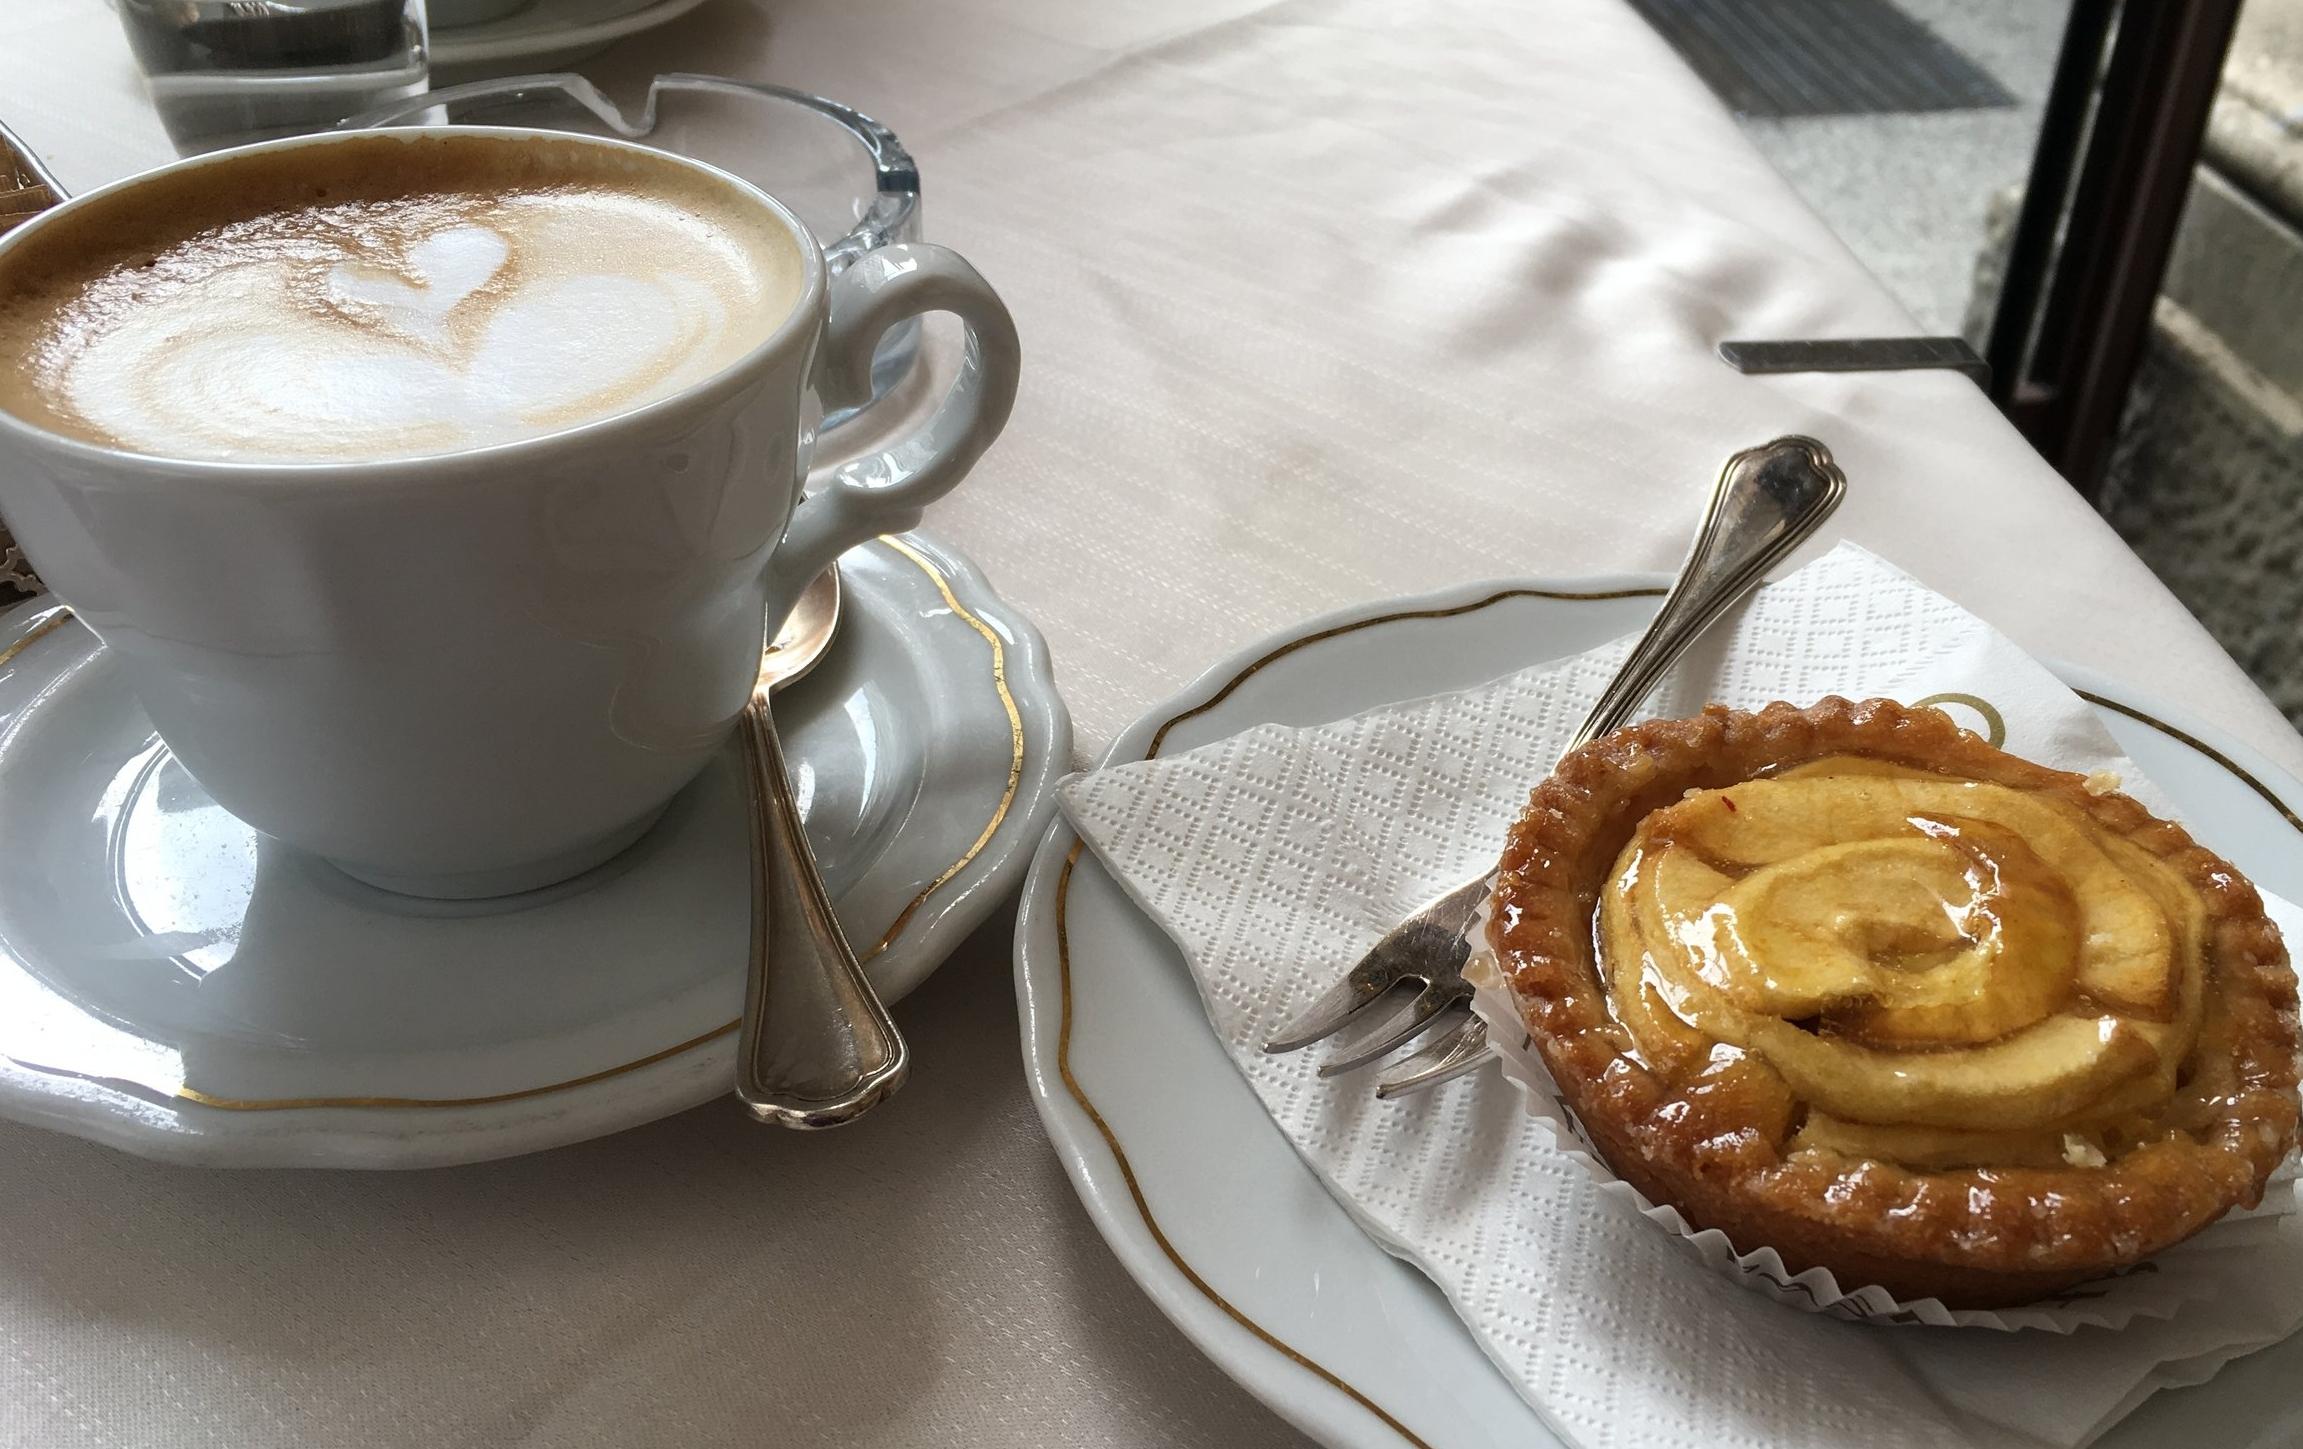 A morning cappuccino and a  torta di mele  (apple tart) at Pasticceria Gamberini.